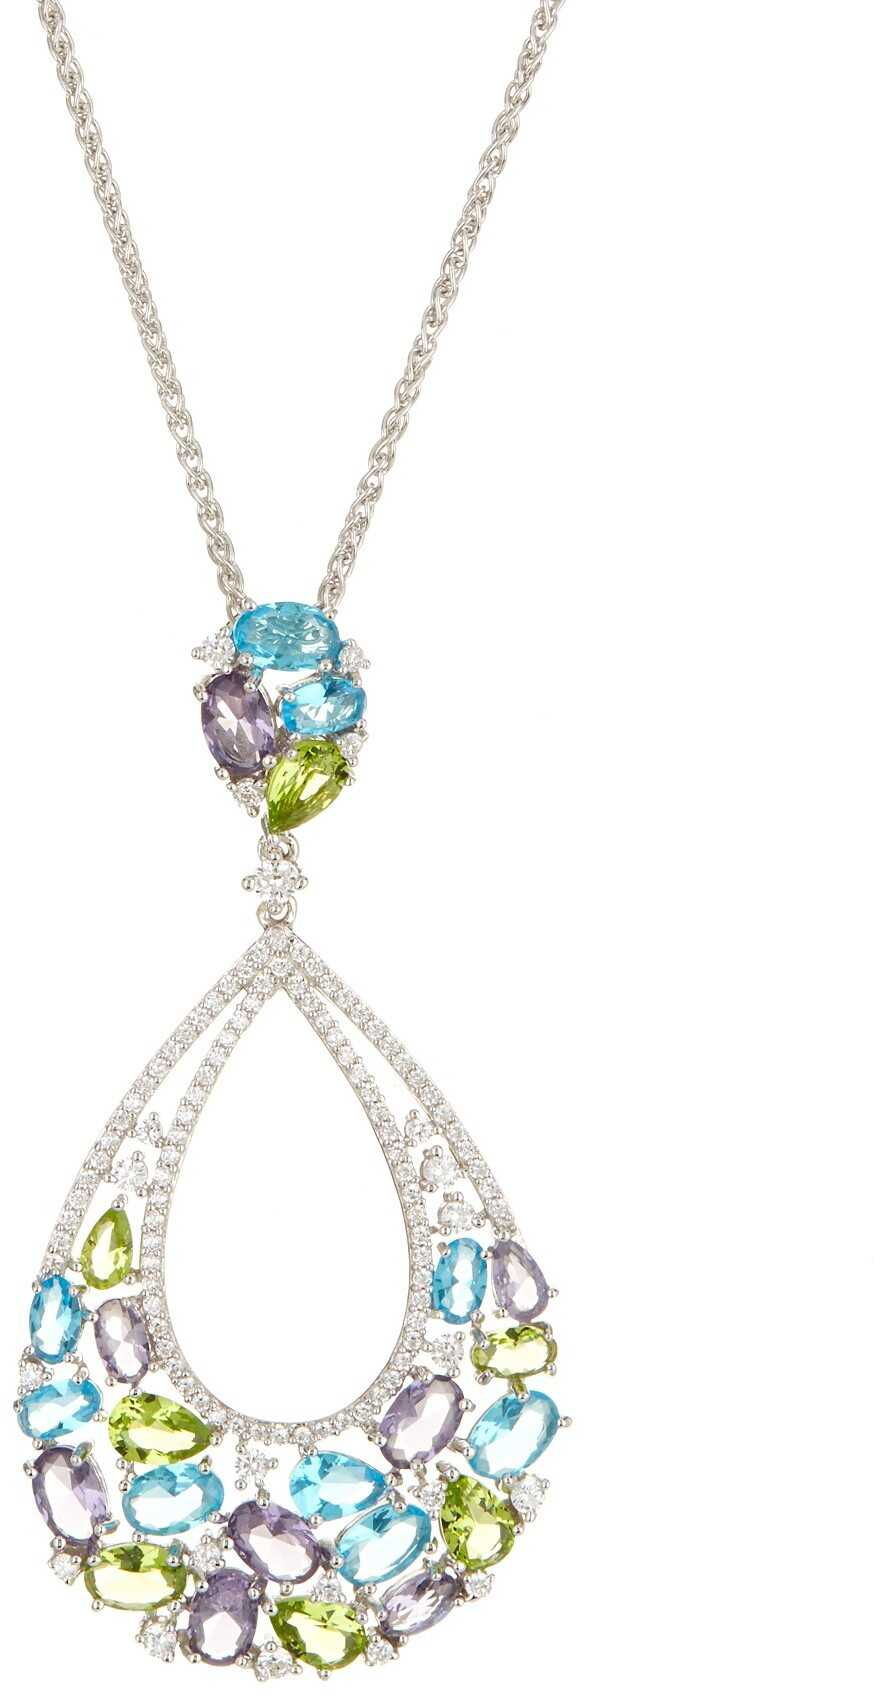 Savvy Cie Oversized Semi Precious Stone Pendant Necklace silver-blue-green-purple